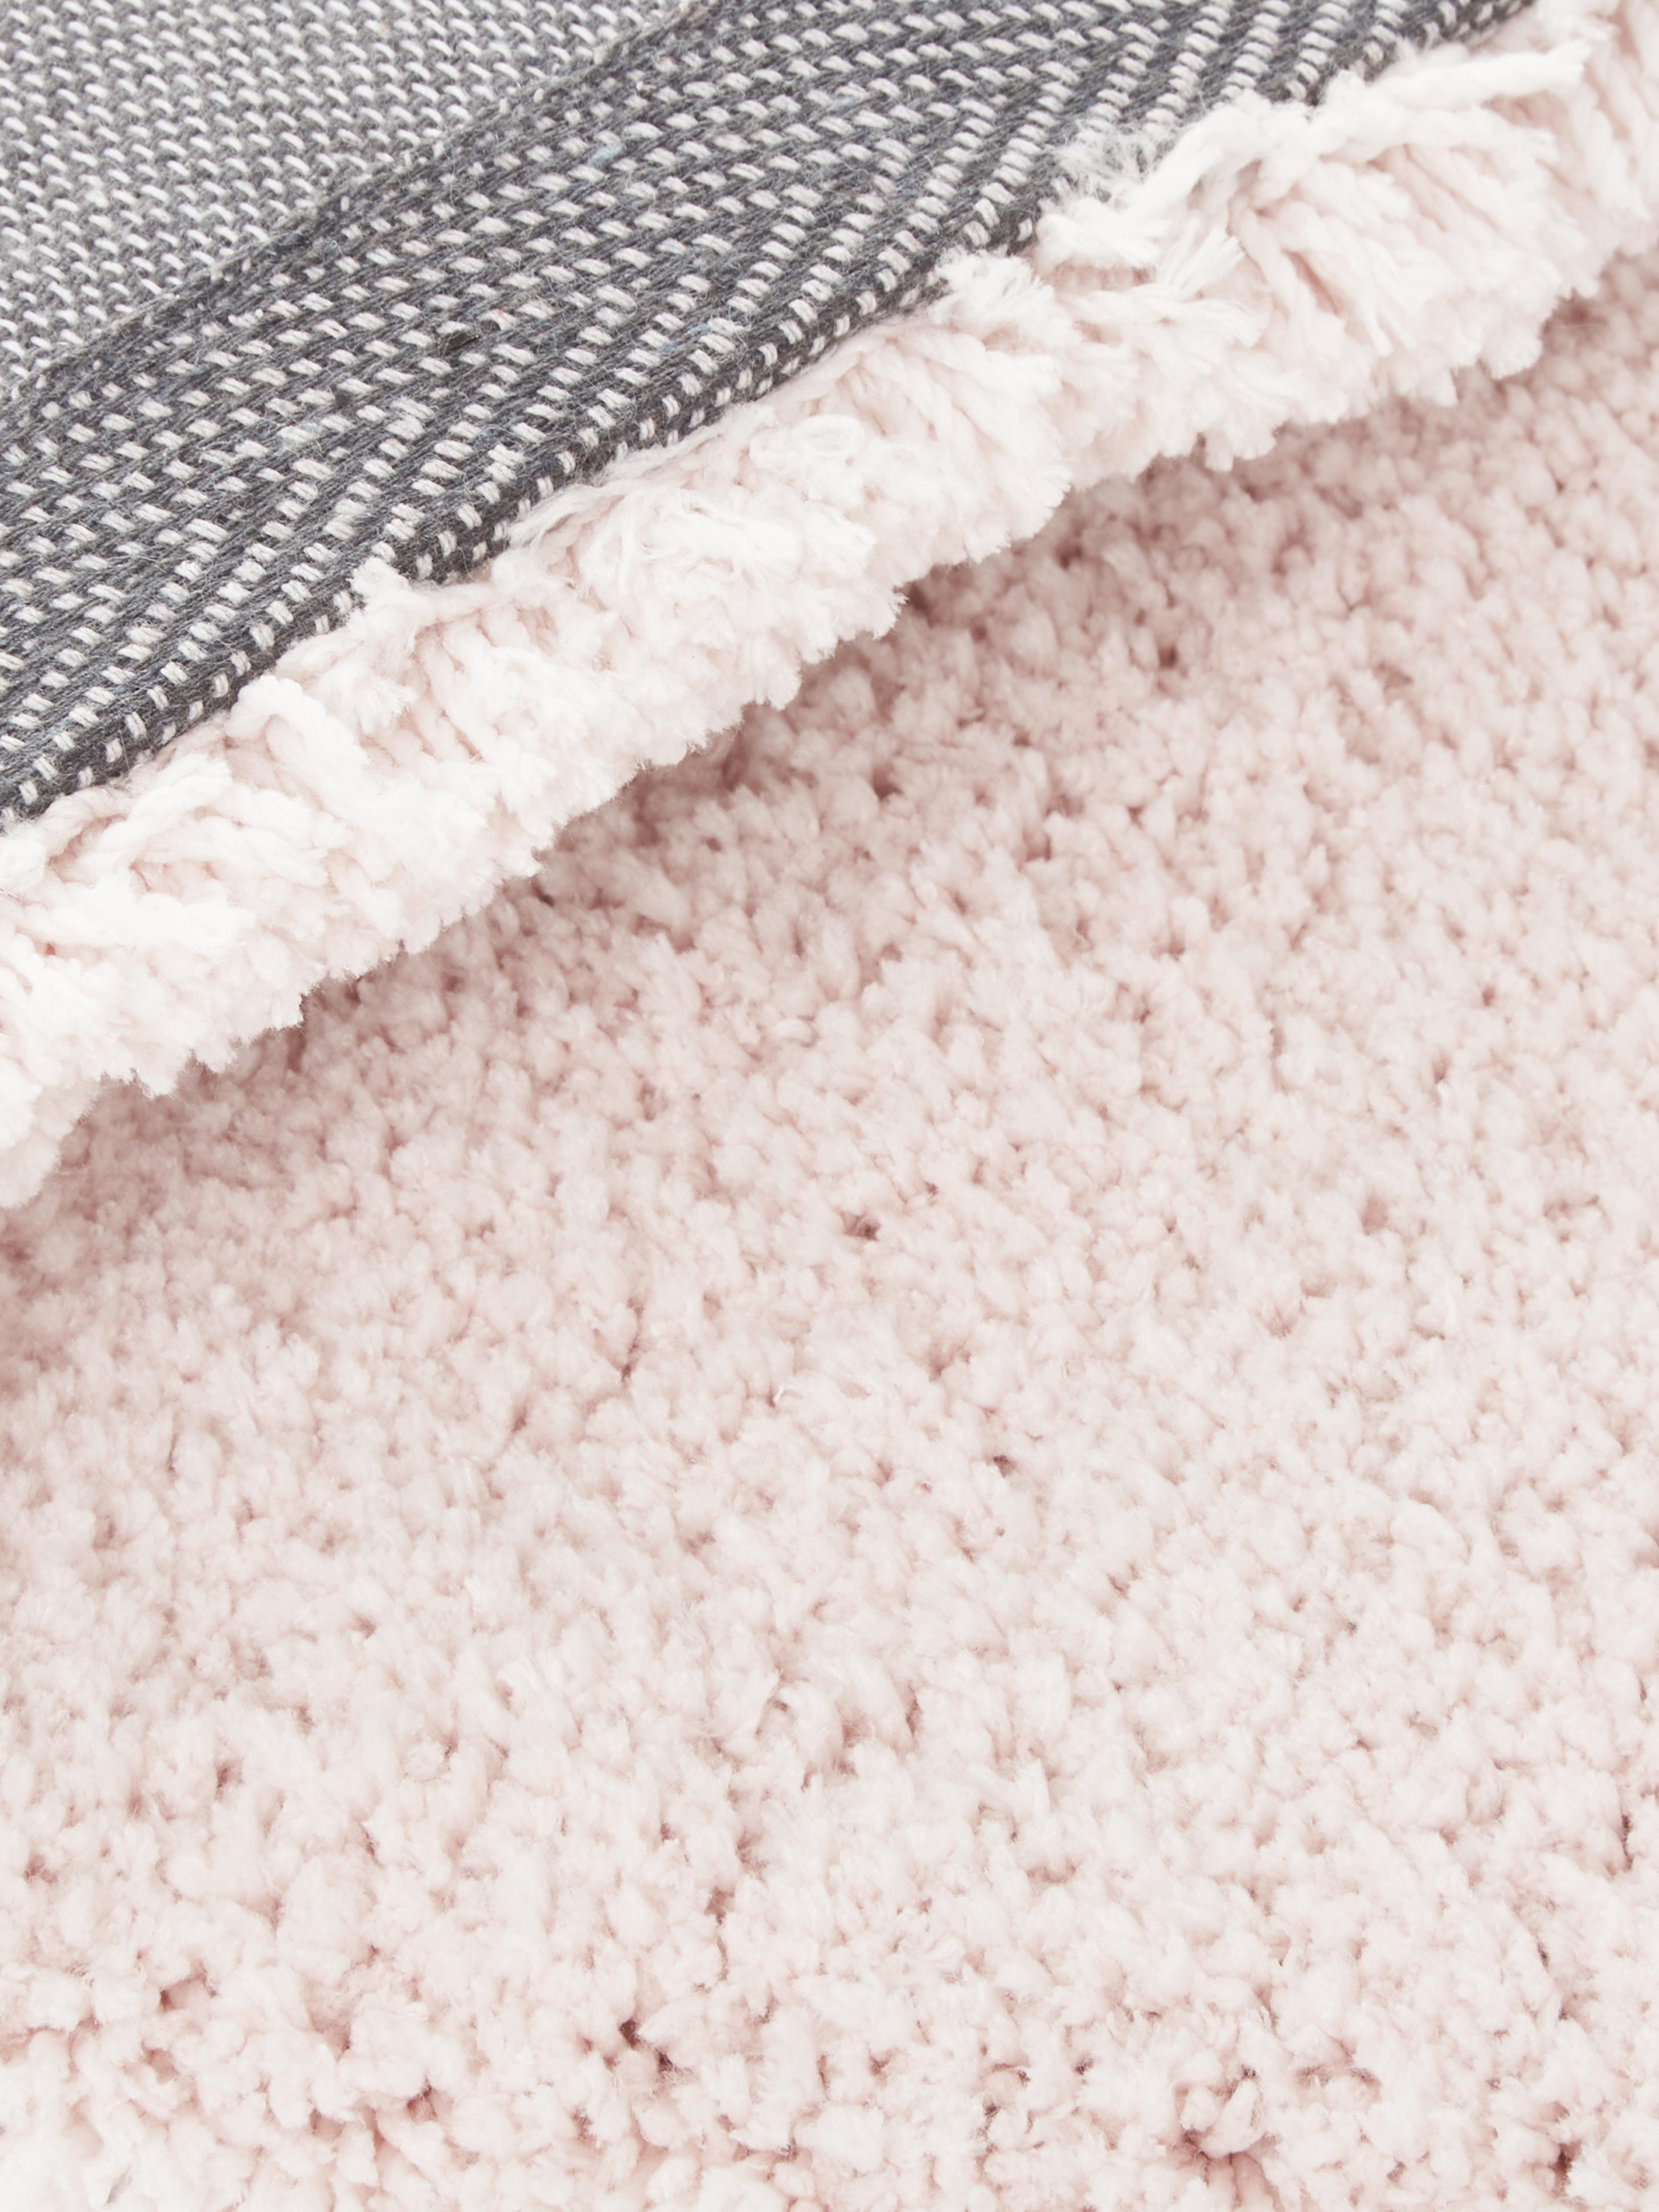 Huňatý koberec s vysokým vlasom Leighton, Bledoružová